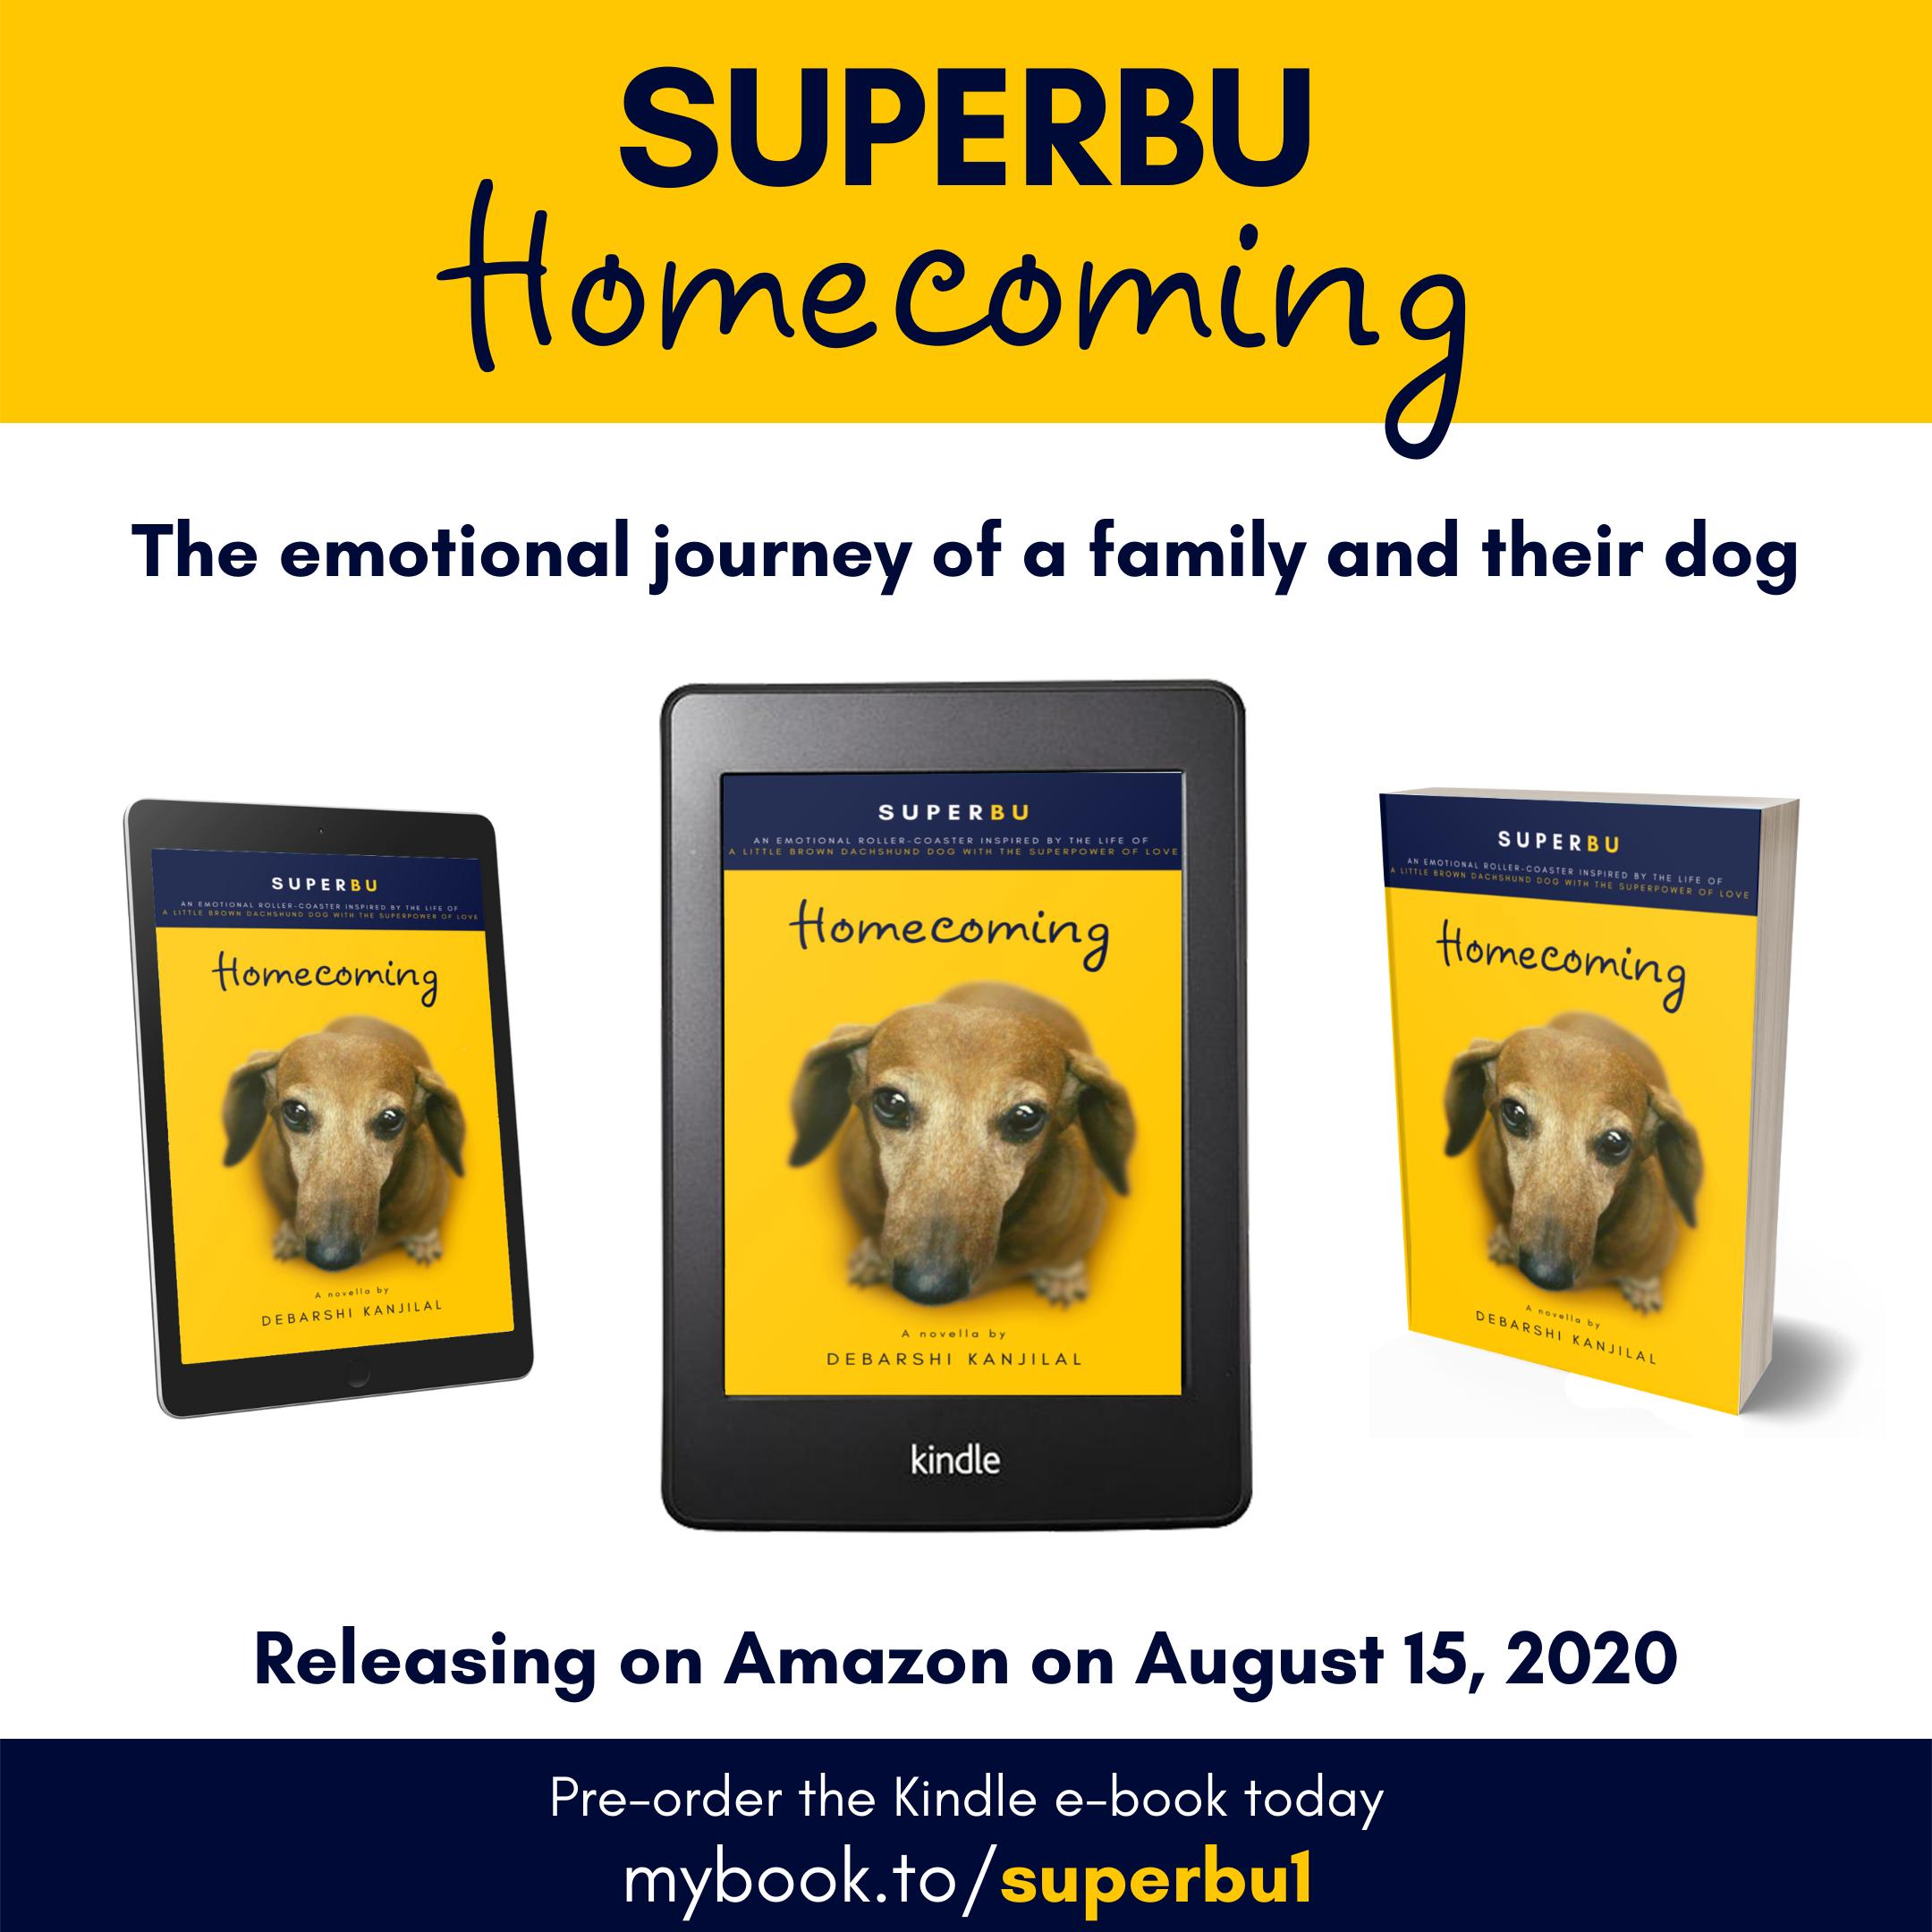 SUPERBU Homecoming tablet